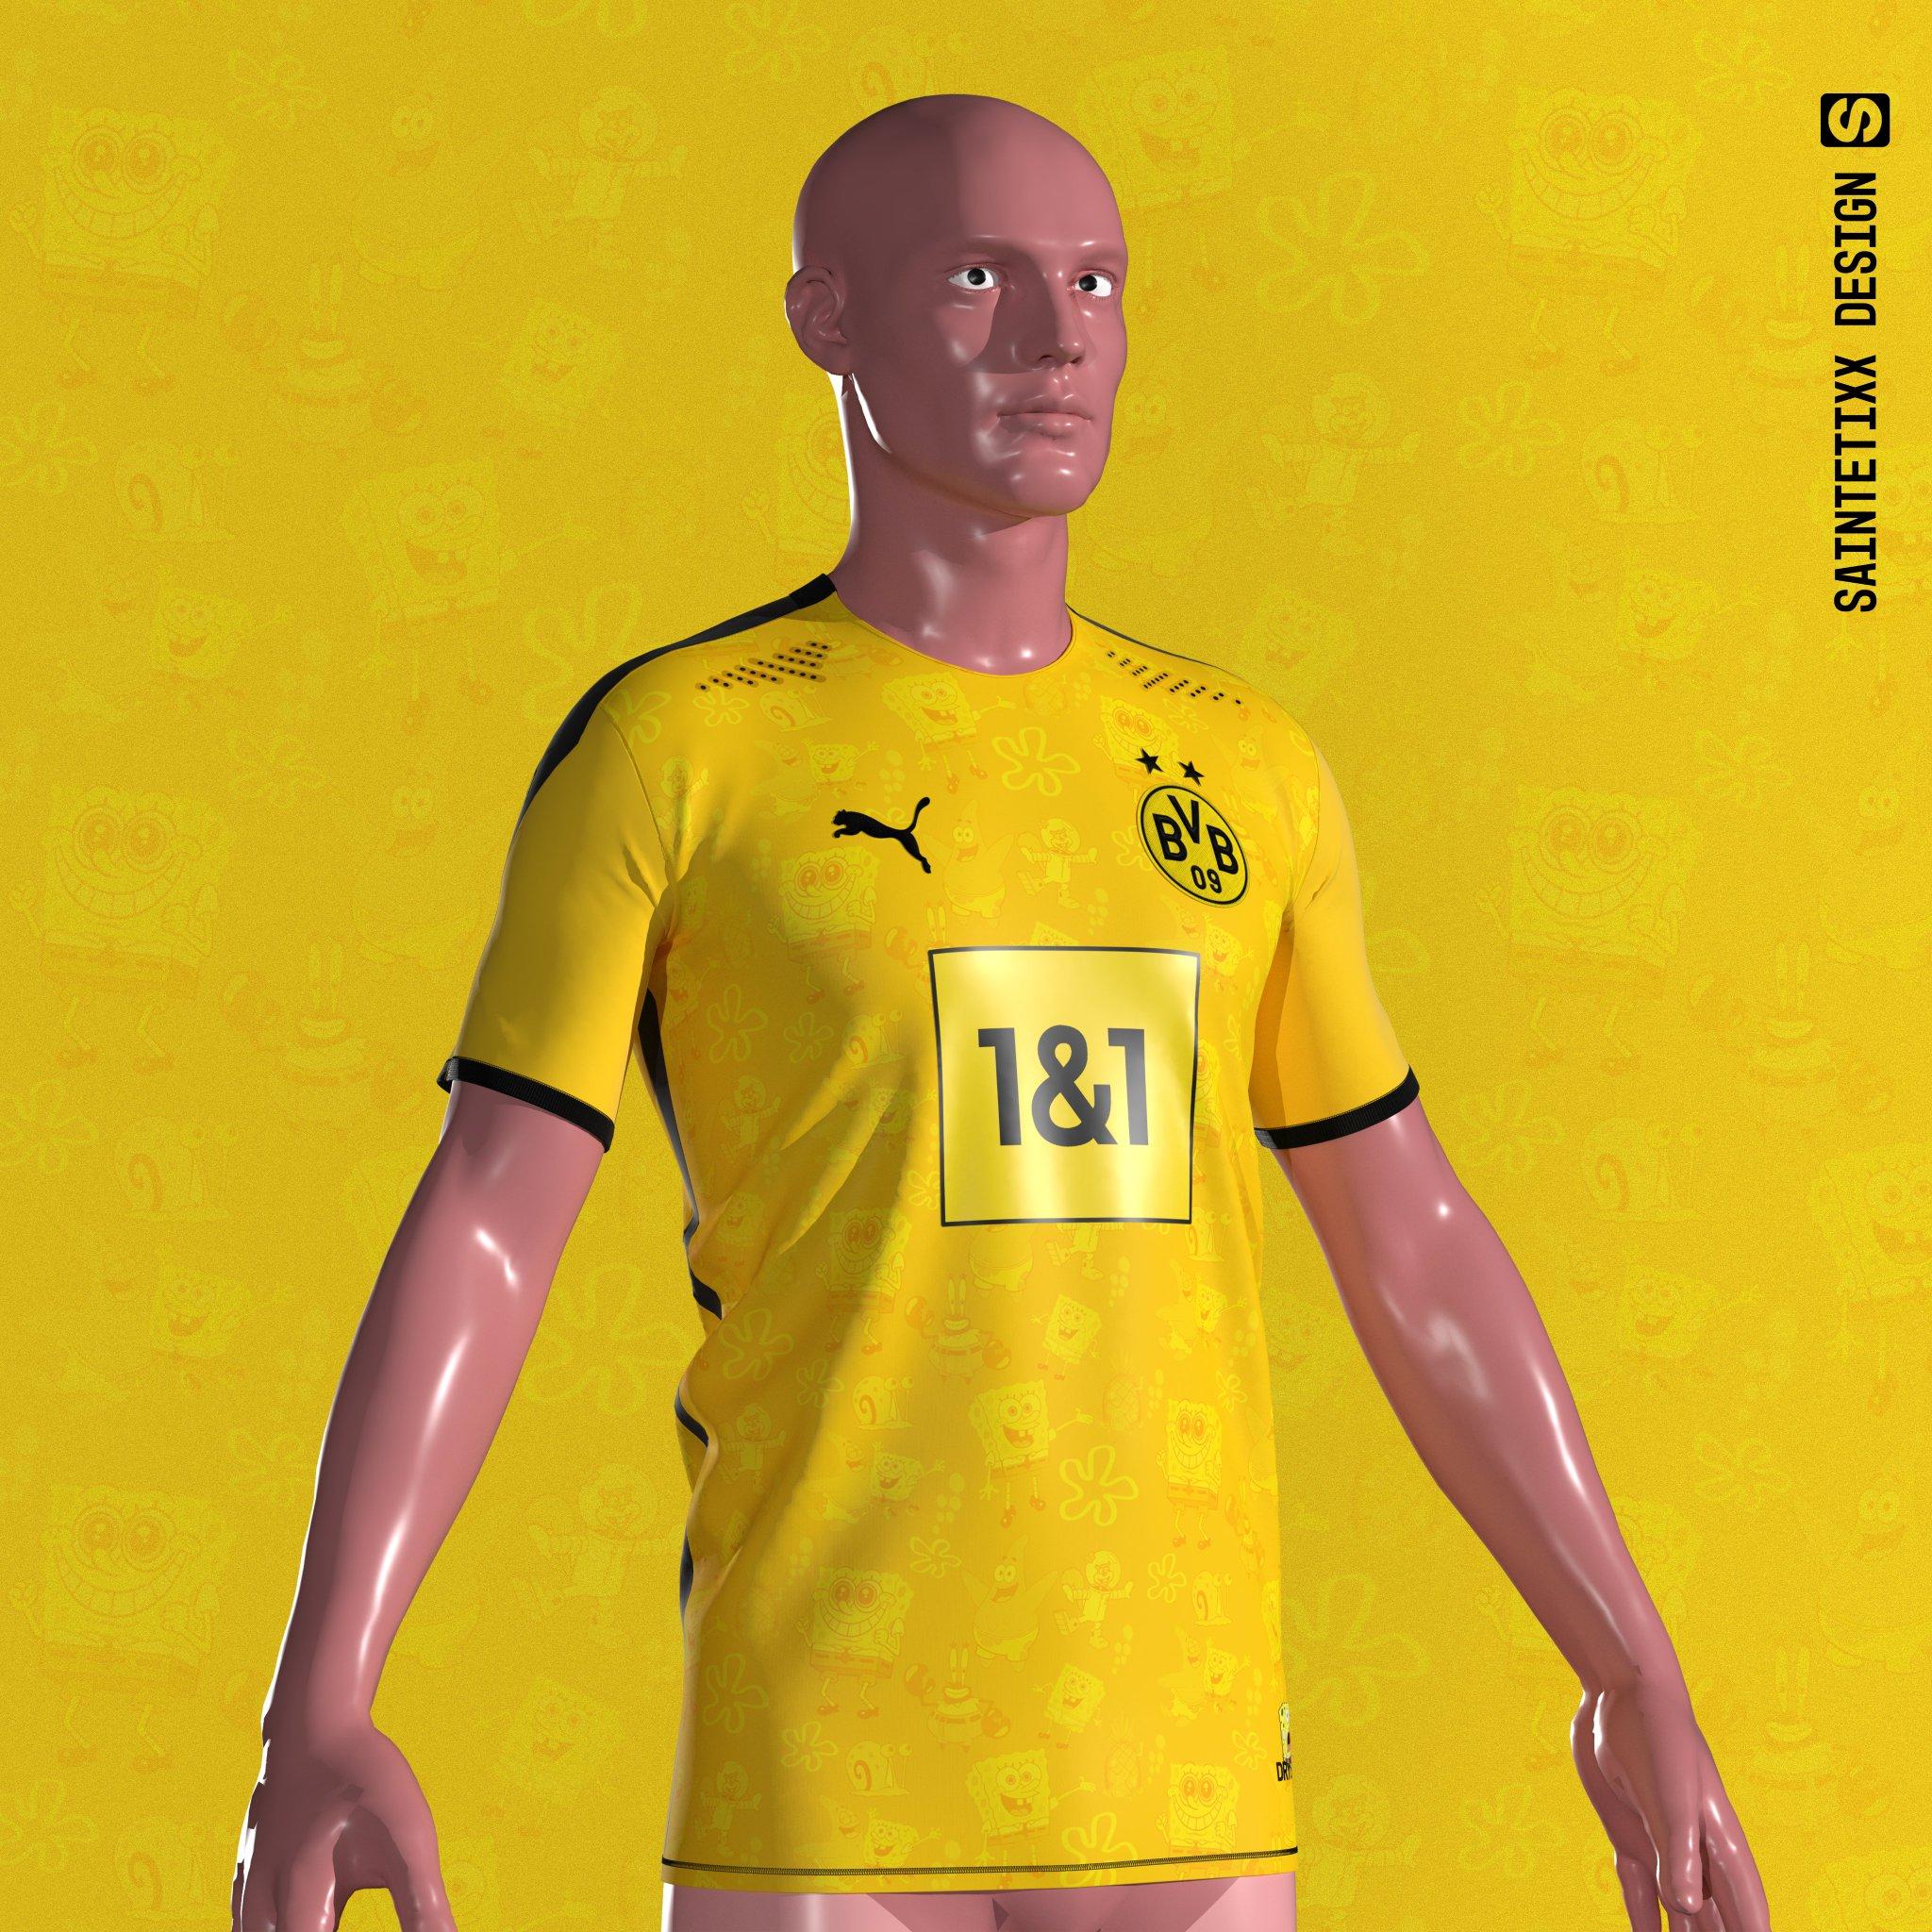 Saintetixx On Twitter Borussia Dortmund X Sponge Bob X Puma Concept Stream Patrick Like That Y Graphics Spongebob Bobleponge Bvb09 Borussia Dortmund Https T Co Bcc4odm0g2